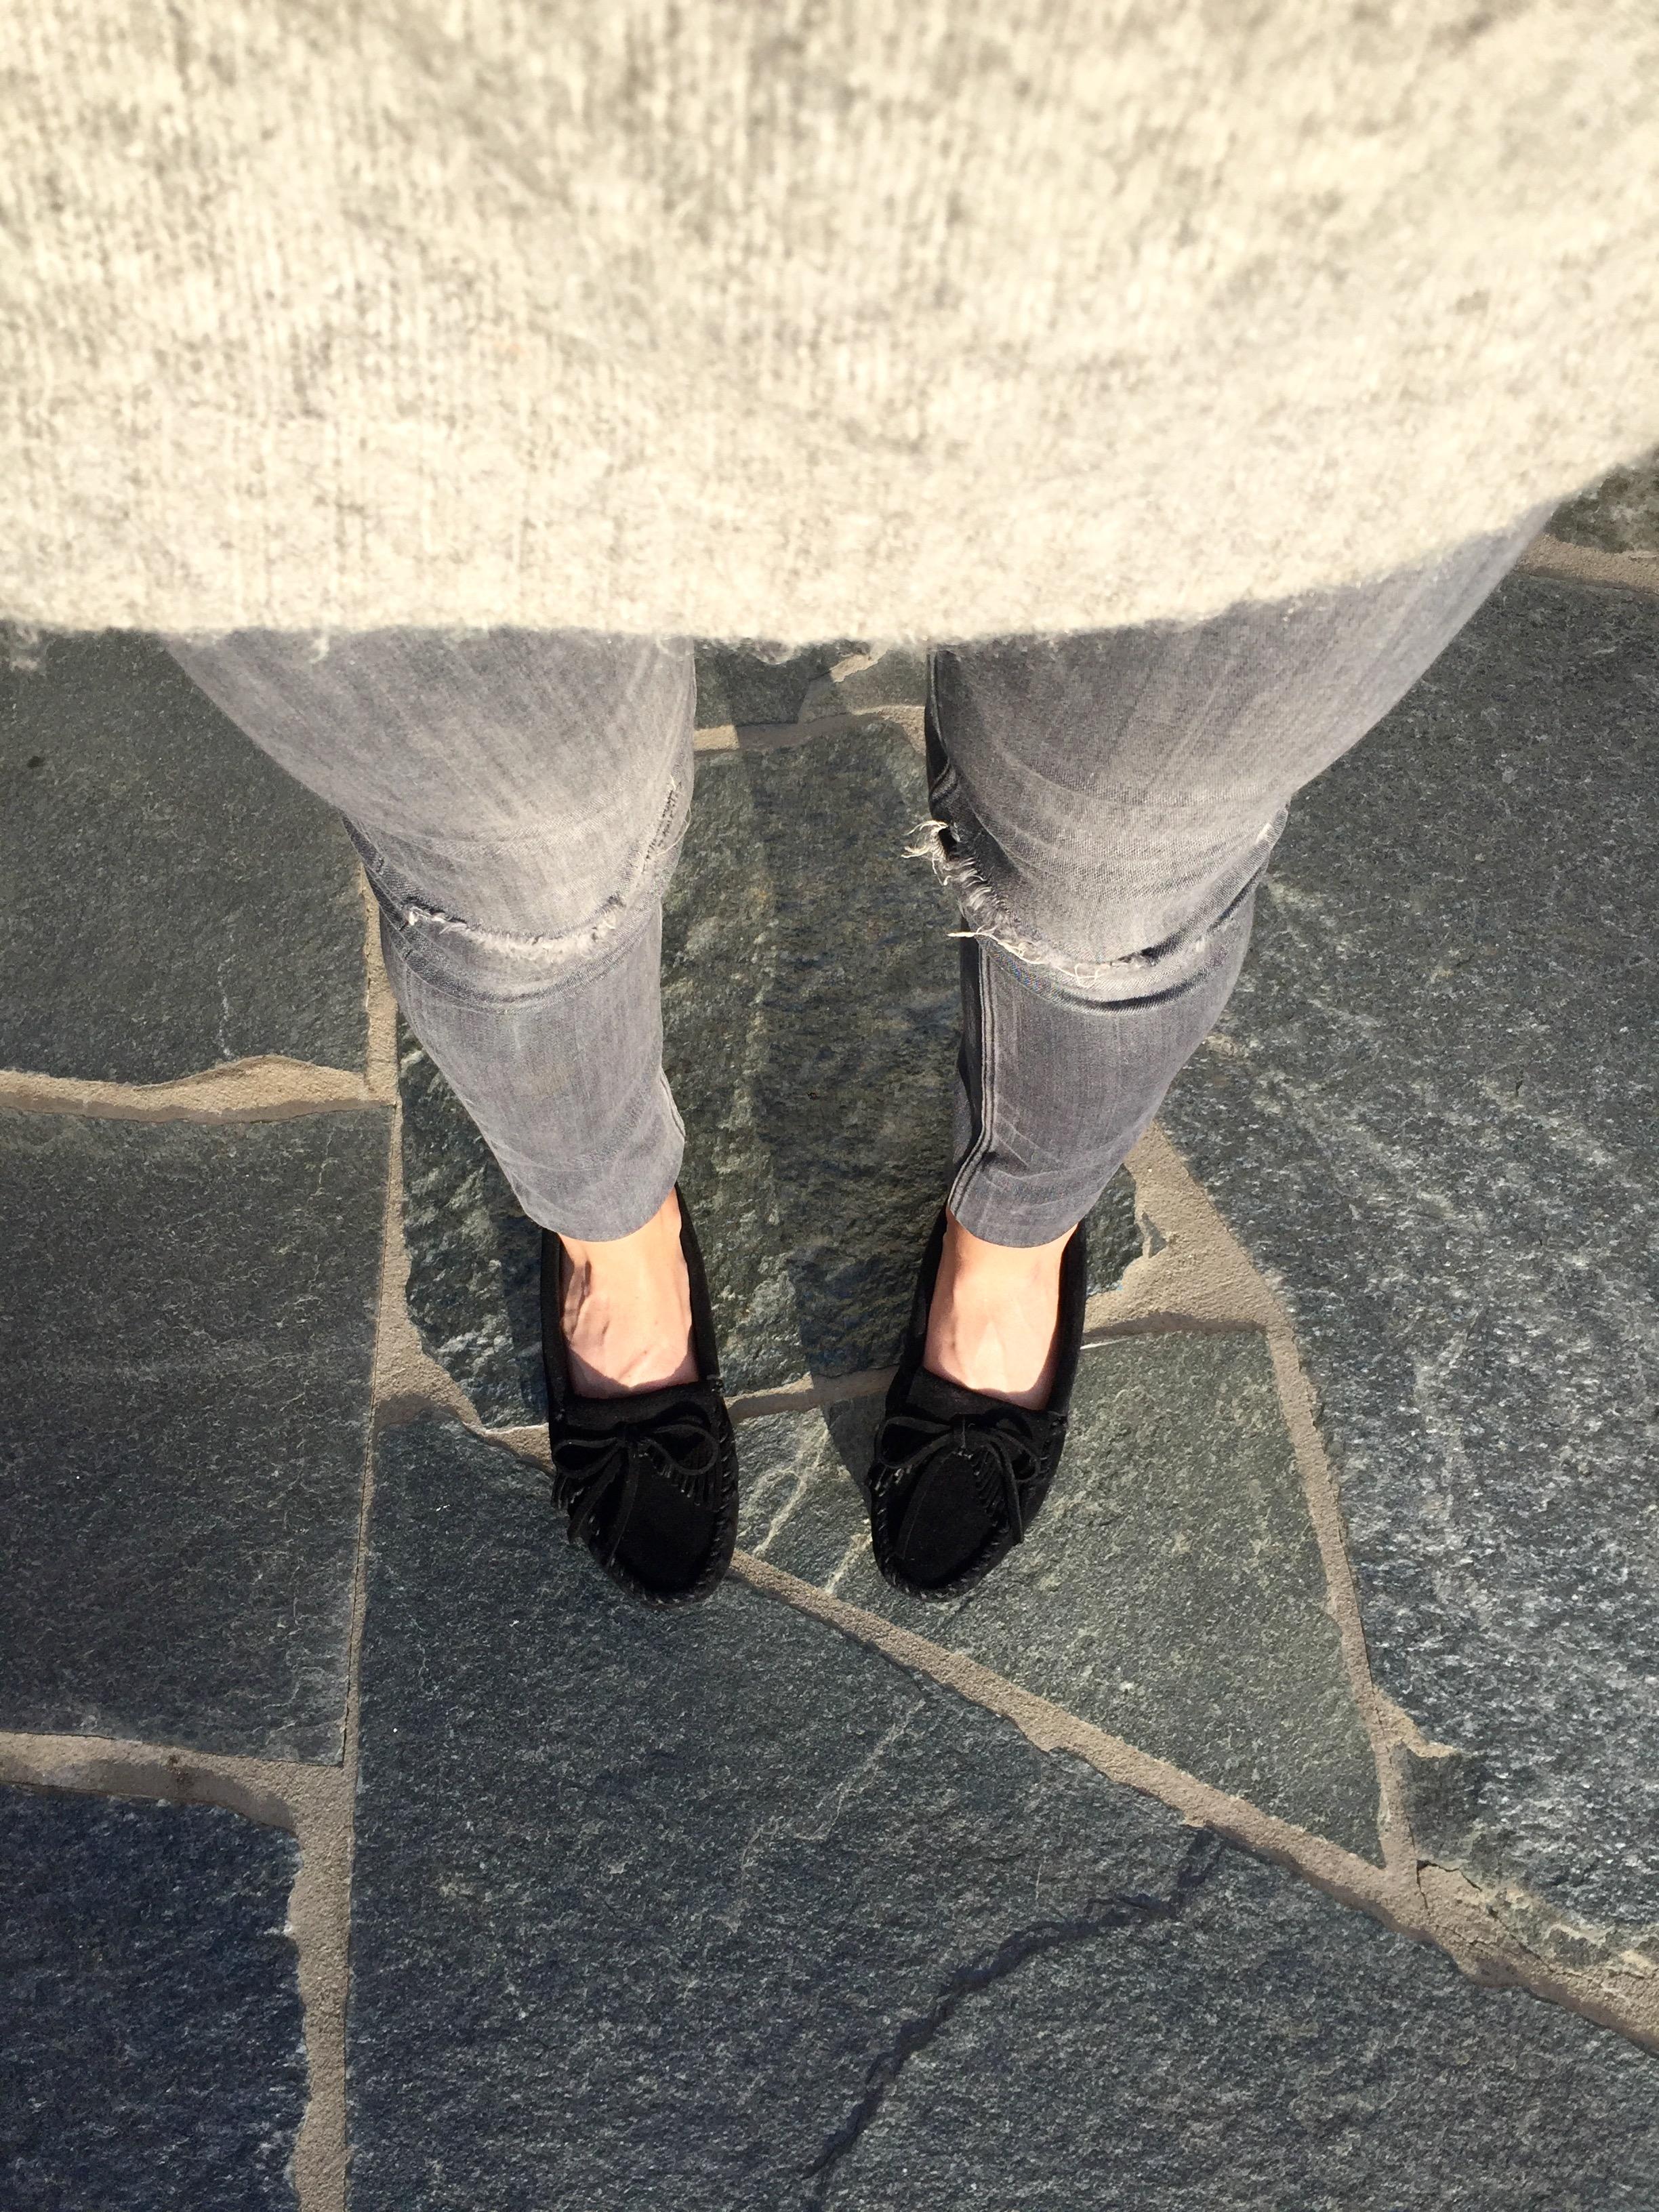 I samarbete med Johanssons skor Sanna Fischer Metro Mode